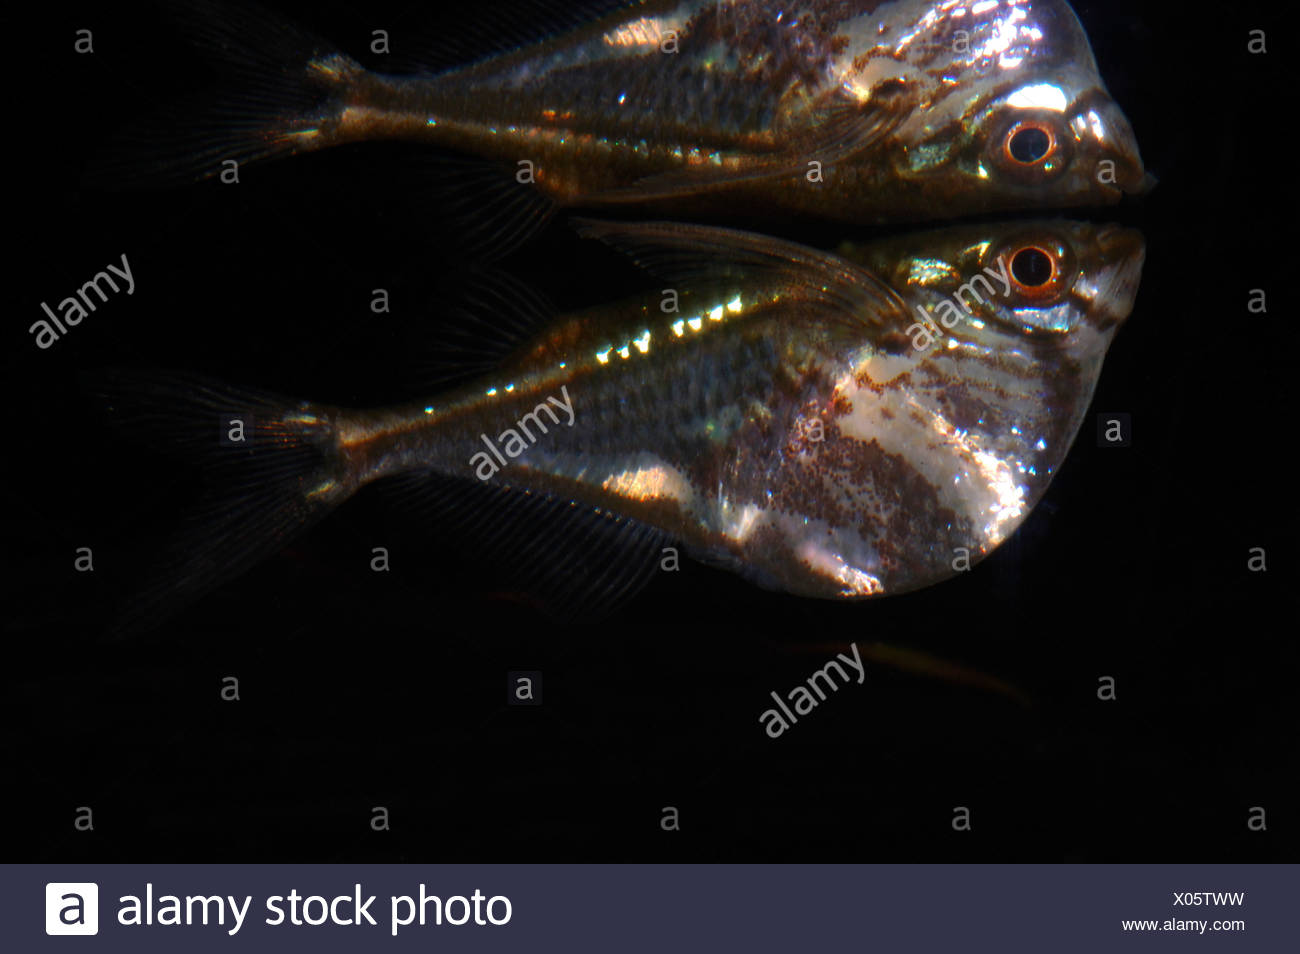 The Hatchet Fish - Gasteropelecidae